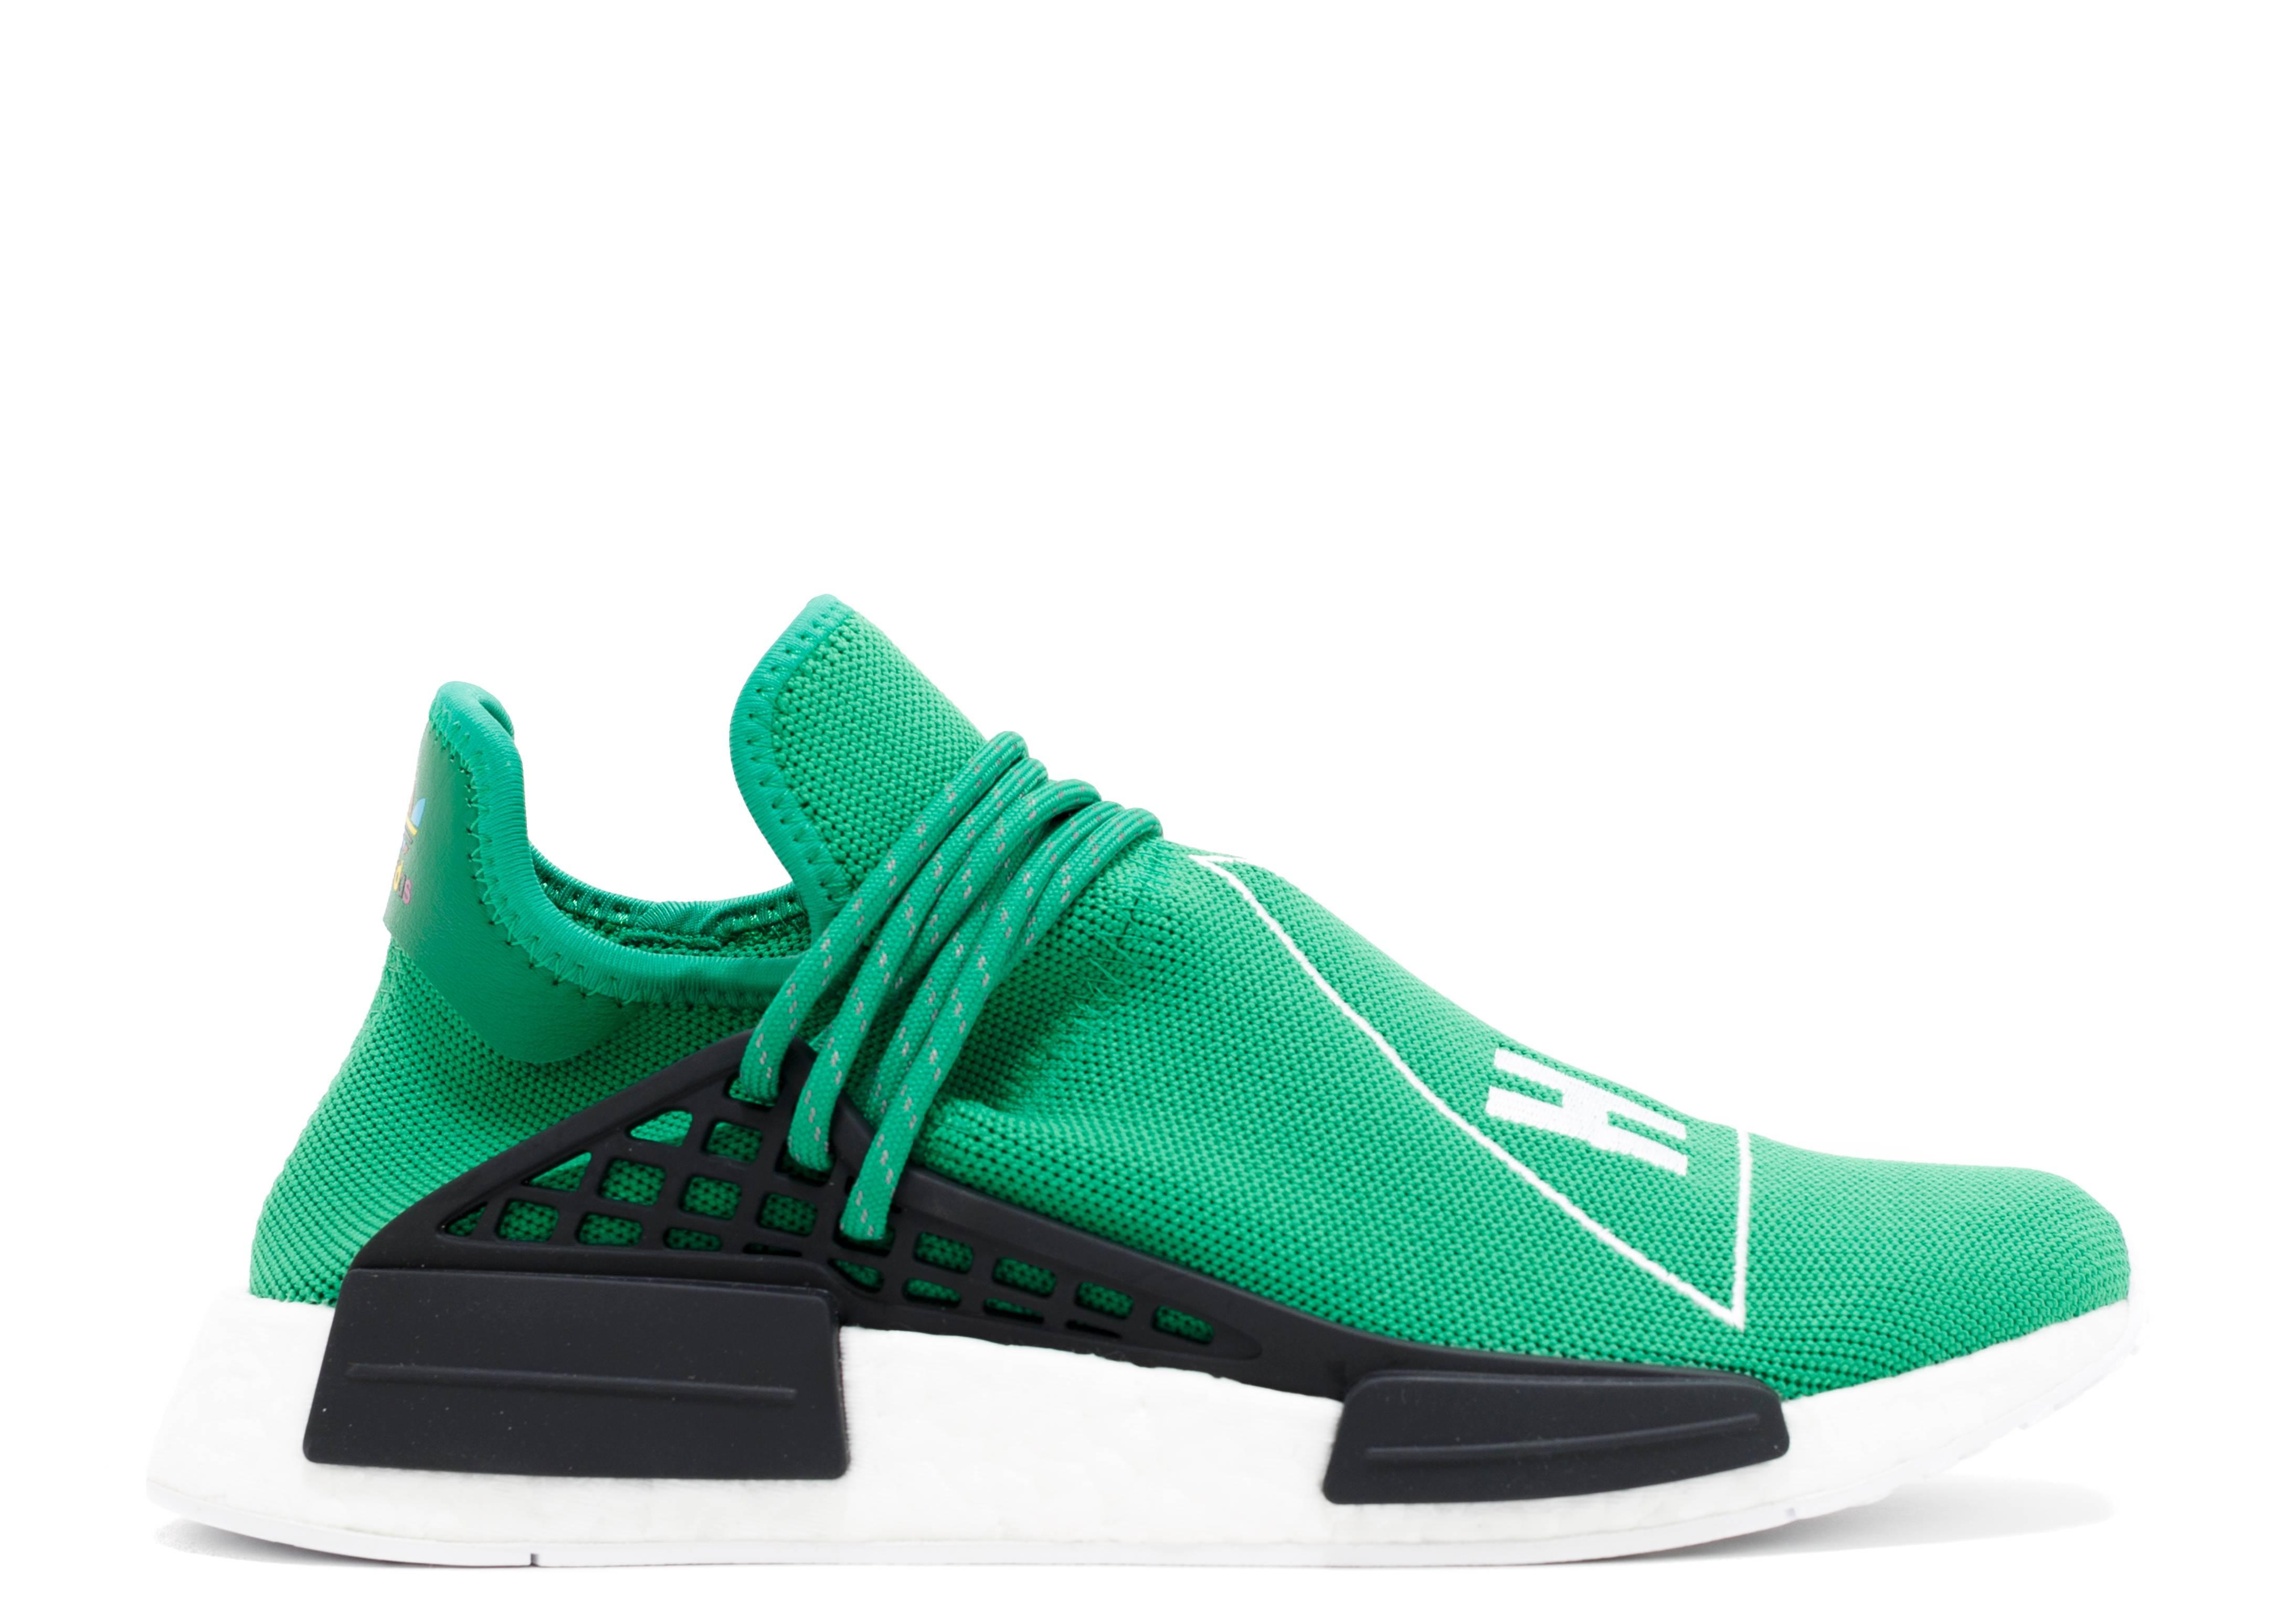 a3dd20c425f2f pharrell x adidas nmd human race shoes all grey shoes uk